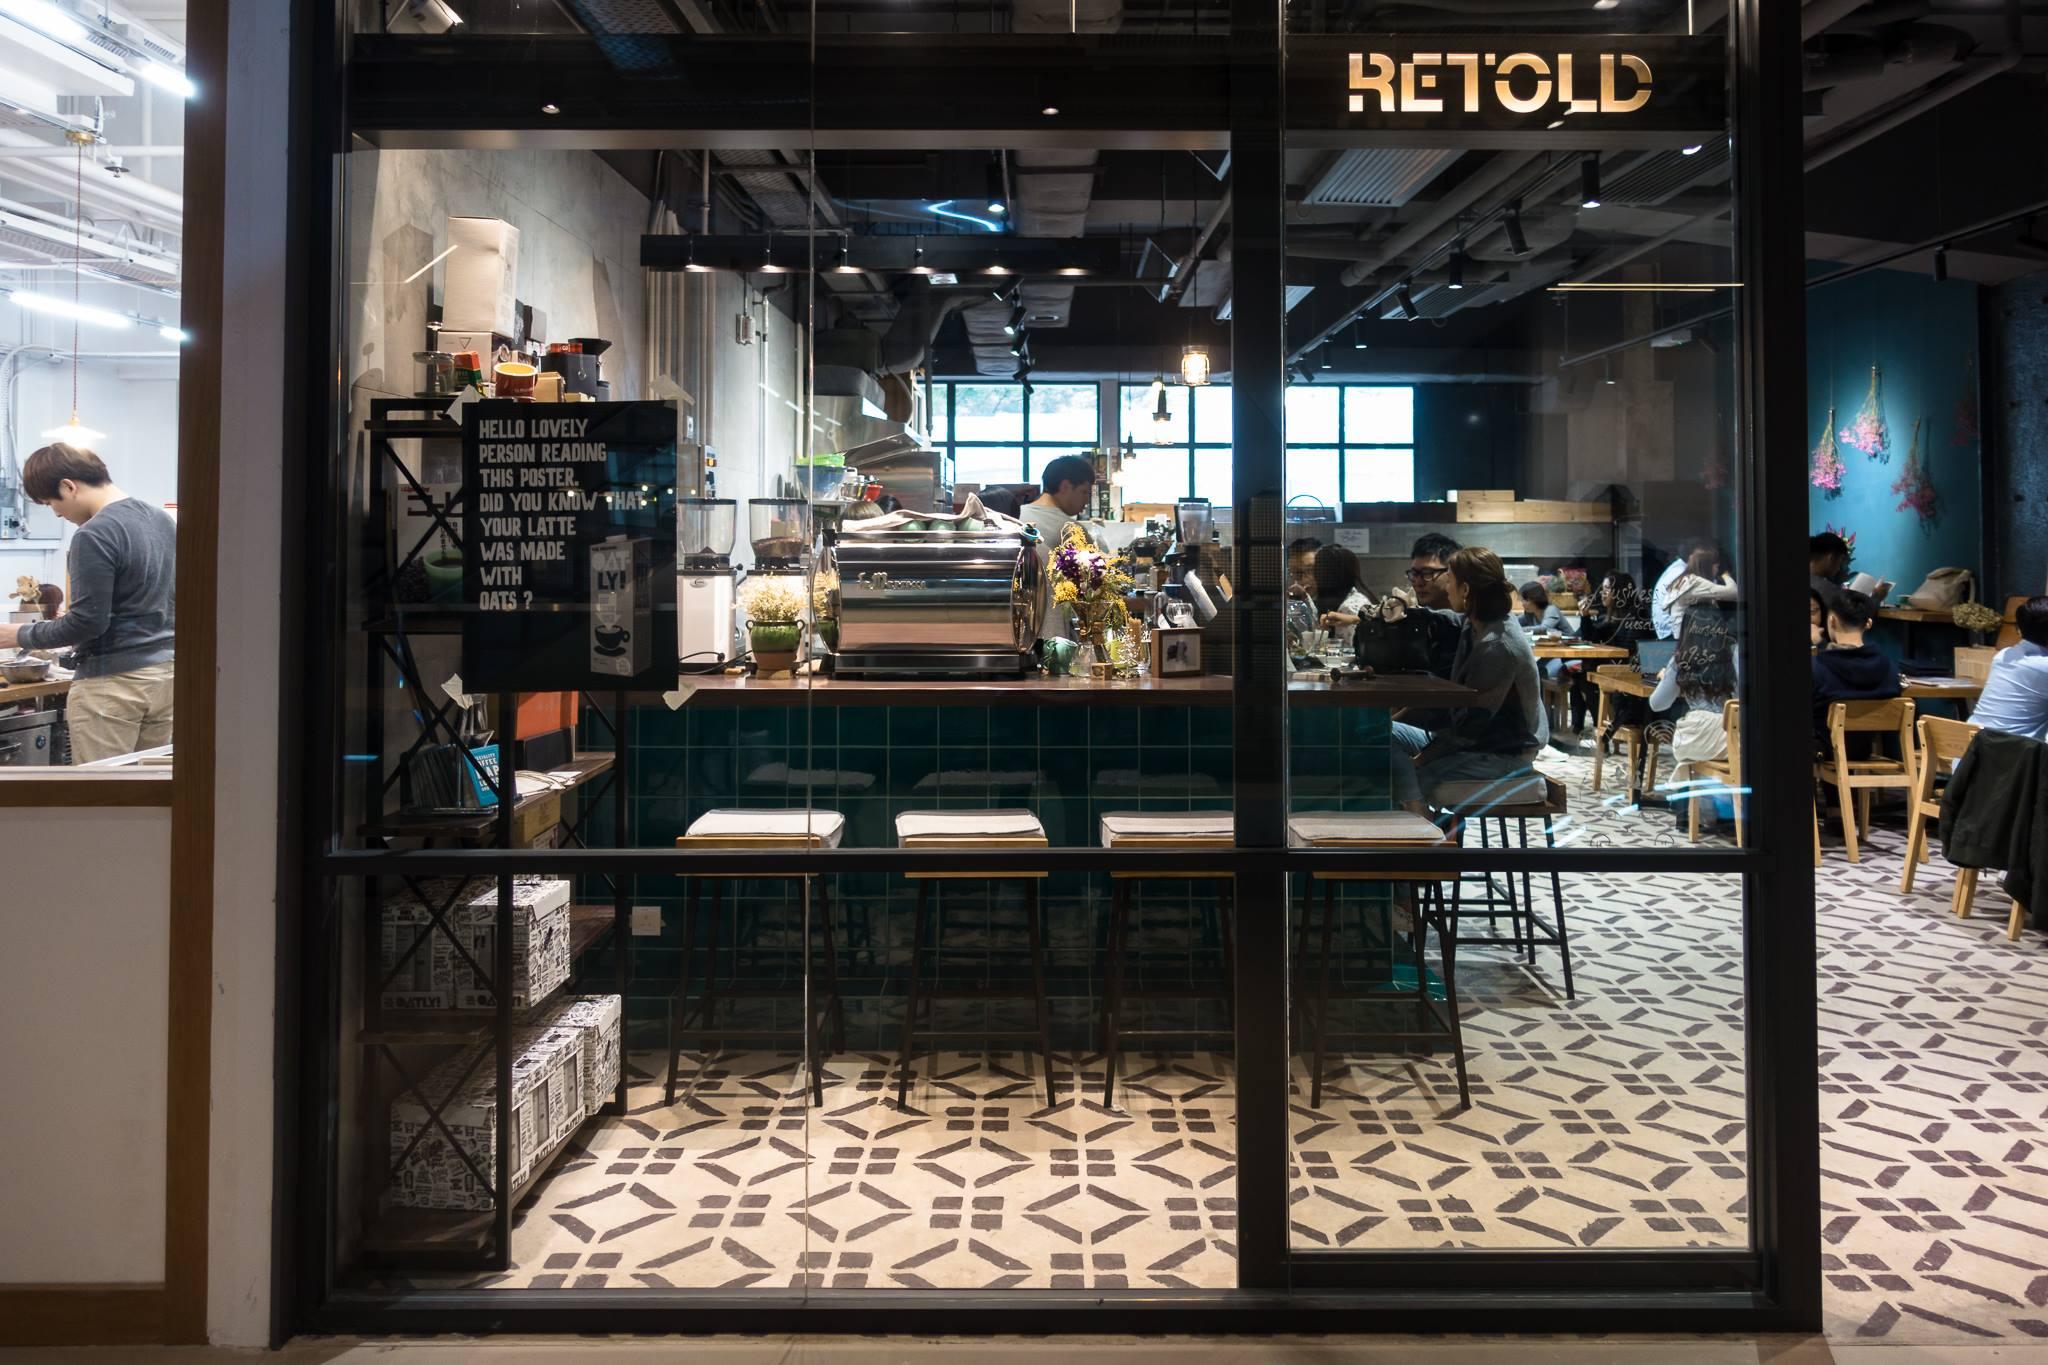 南豐紗廠cafe-retold